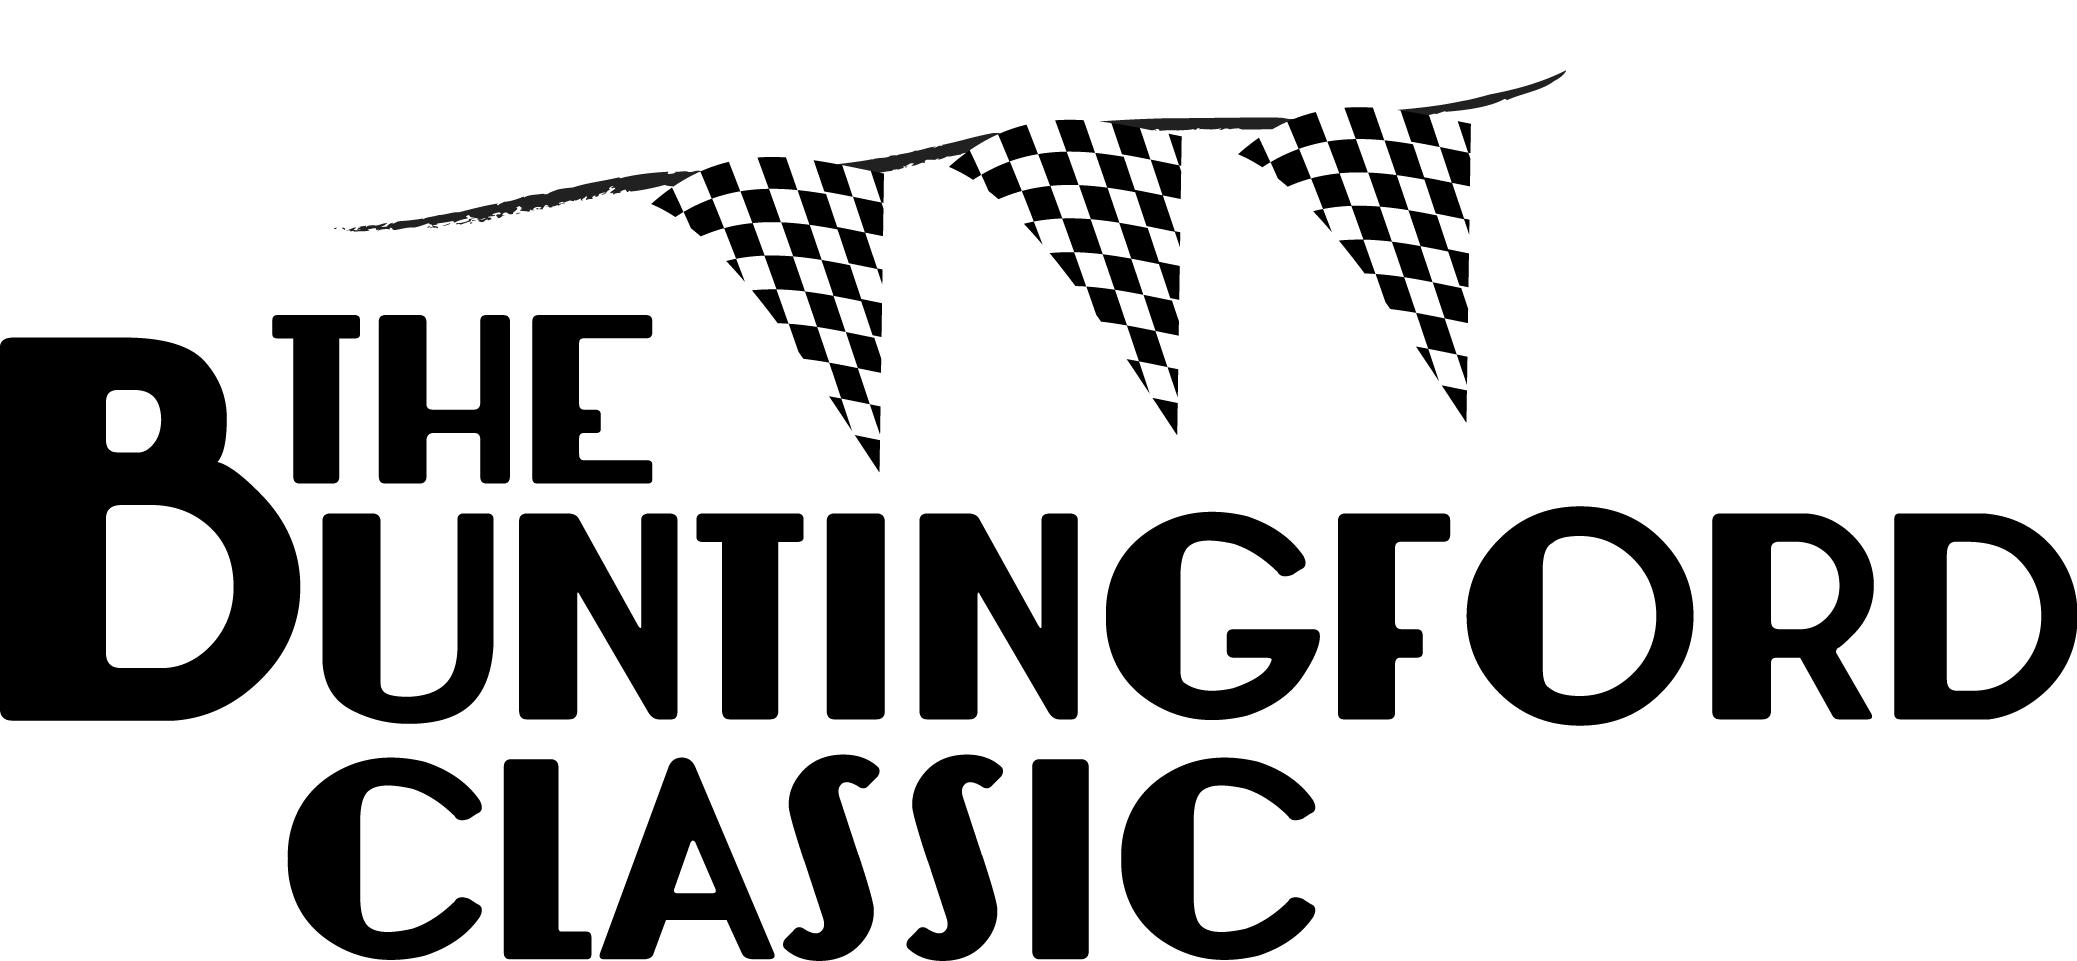 Buntingford Classic